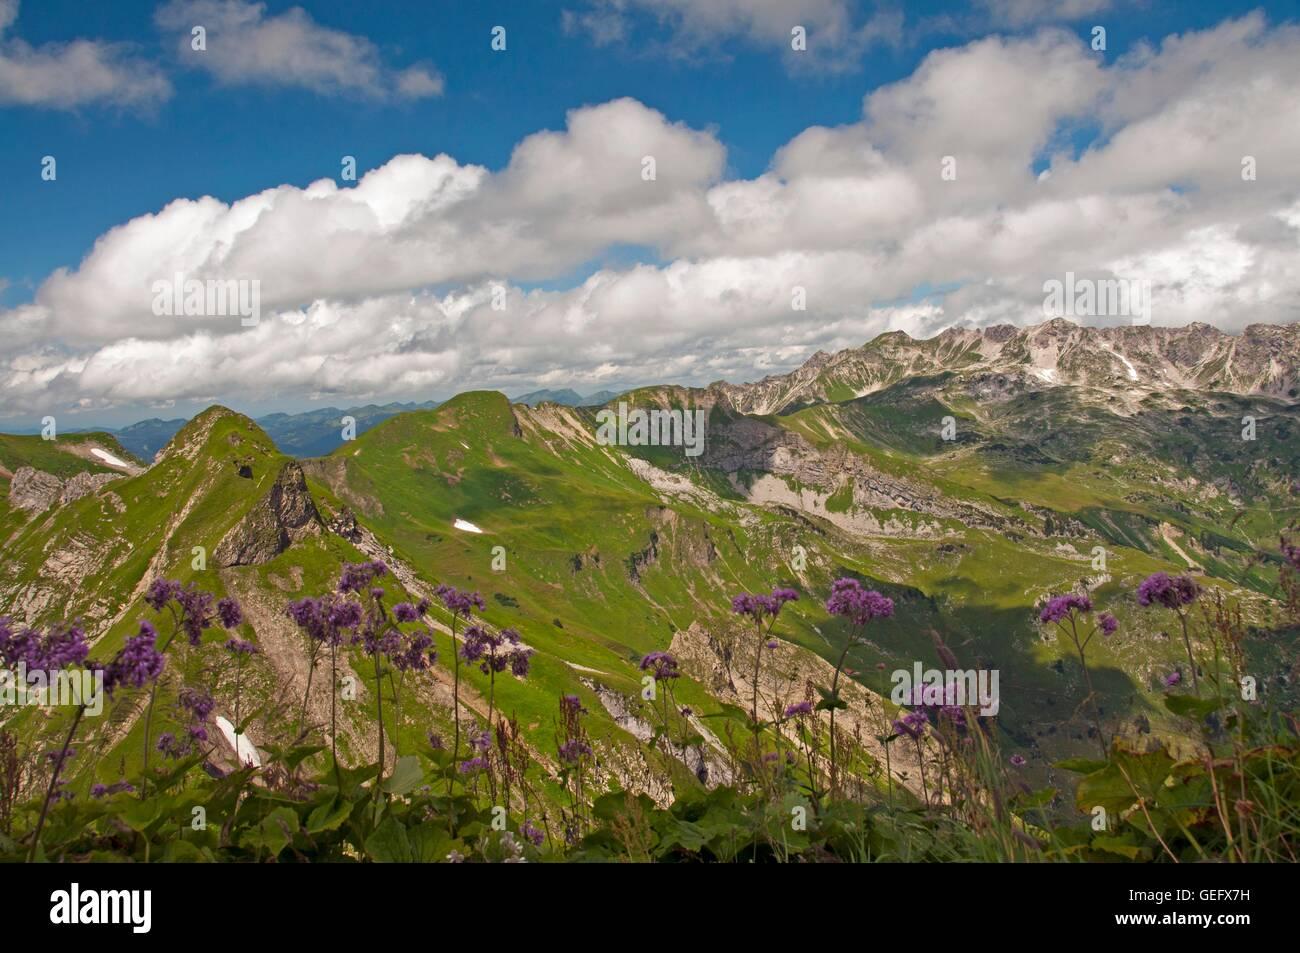 Allgaeu Alps, Bavaria - Stock Image